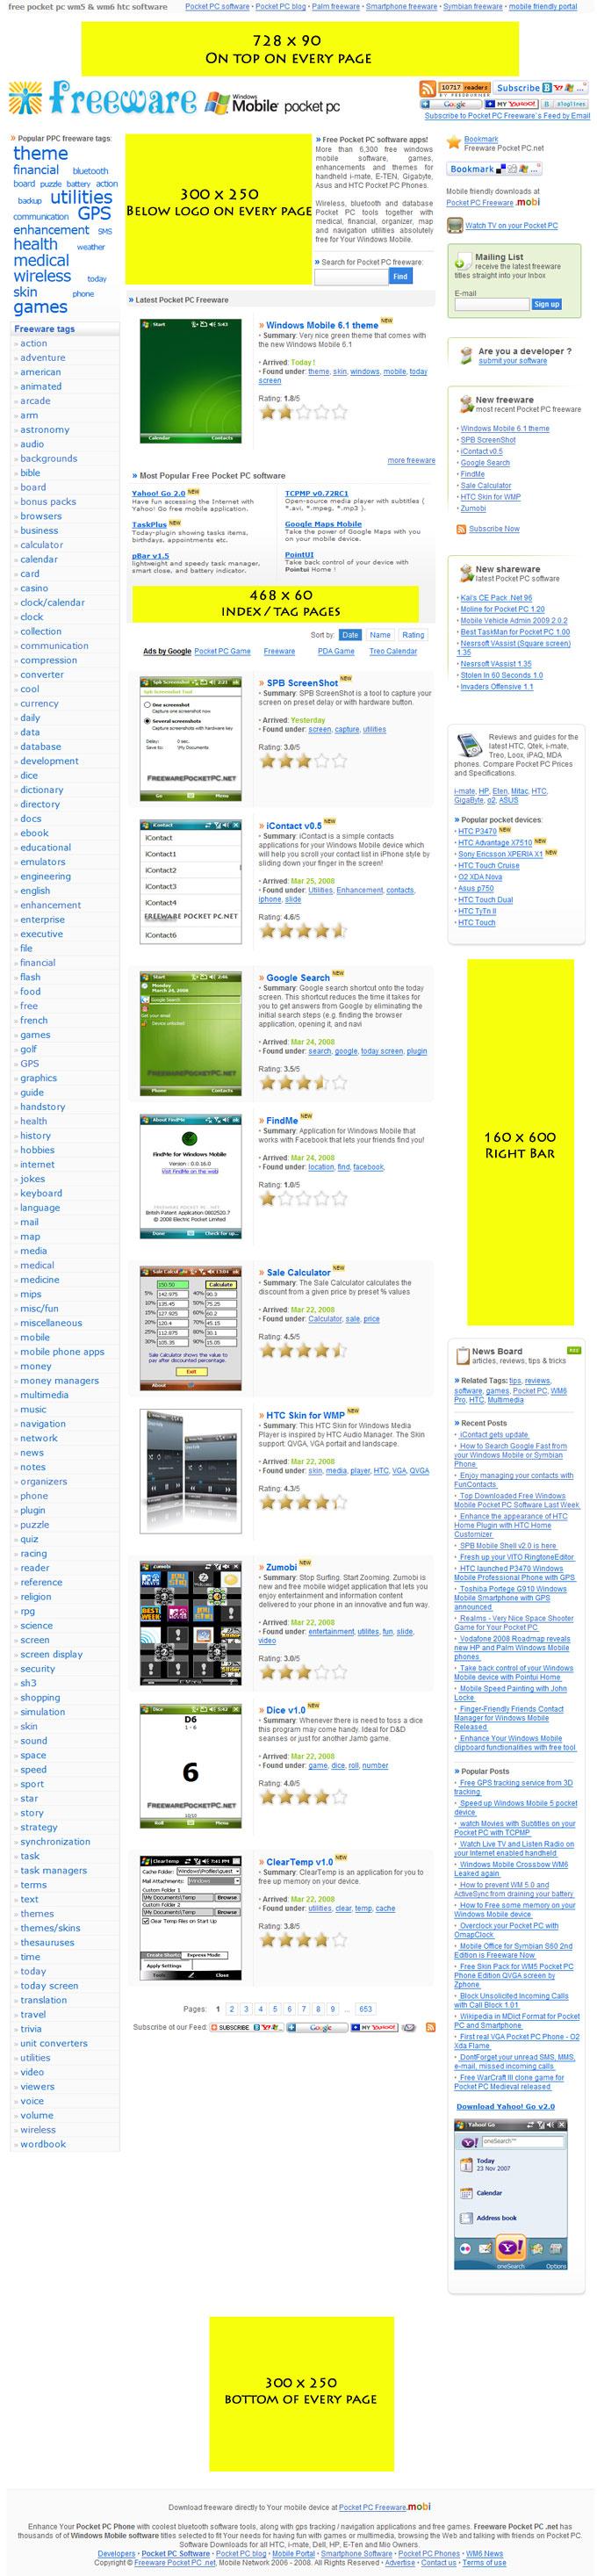 View Advertising Spots on Freeware Pocket PC .net